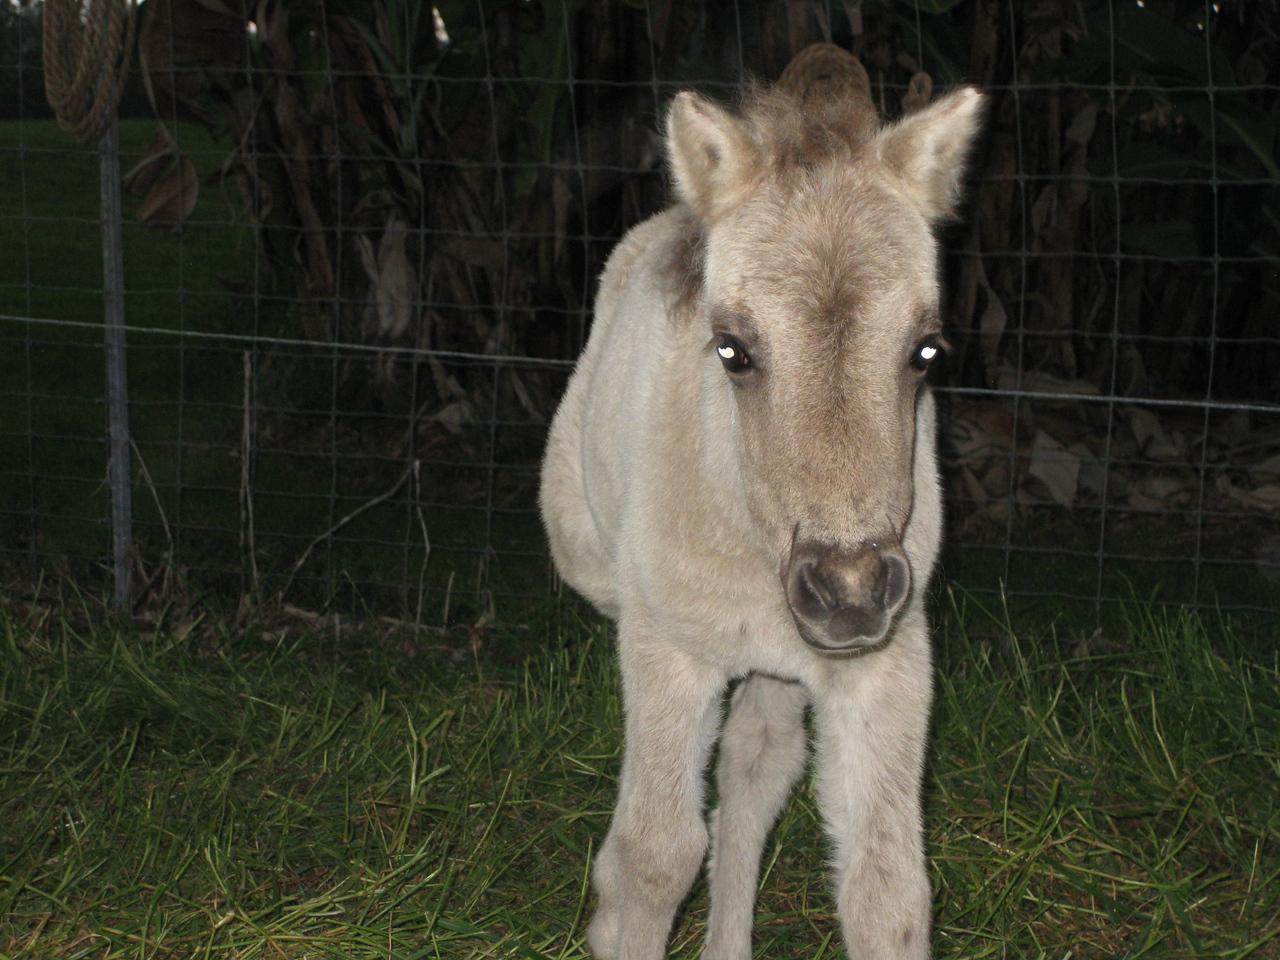 6 week old miniature horse. Shortly before I shocked it.